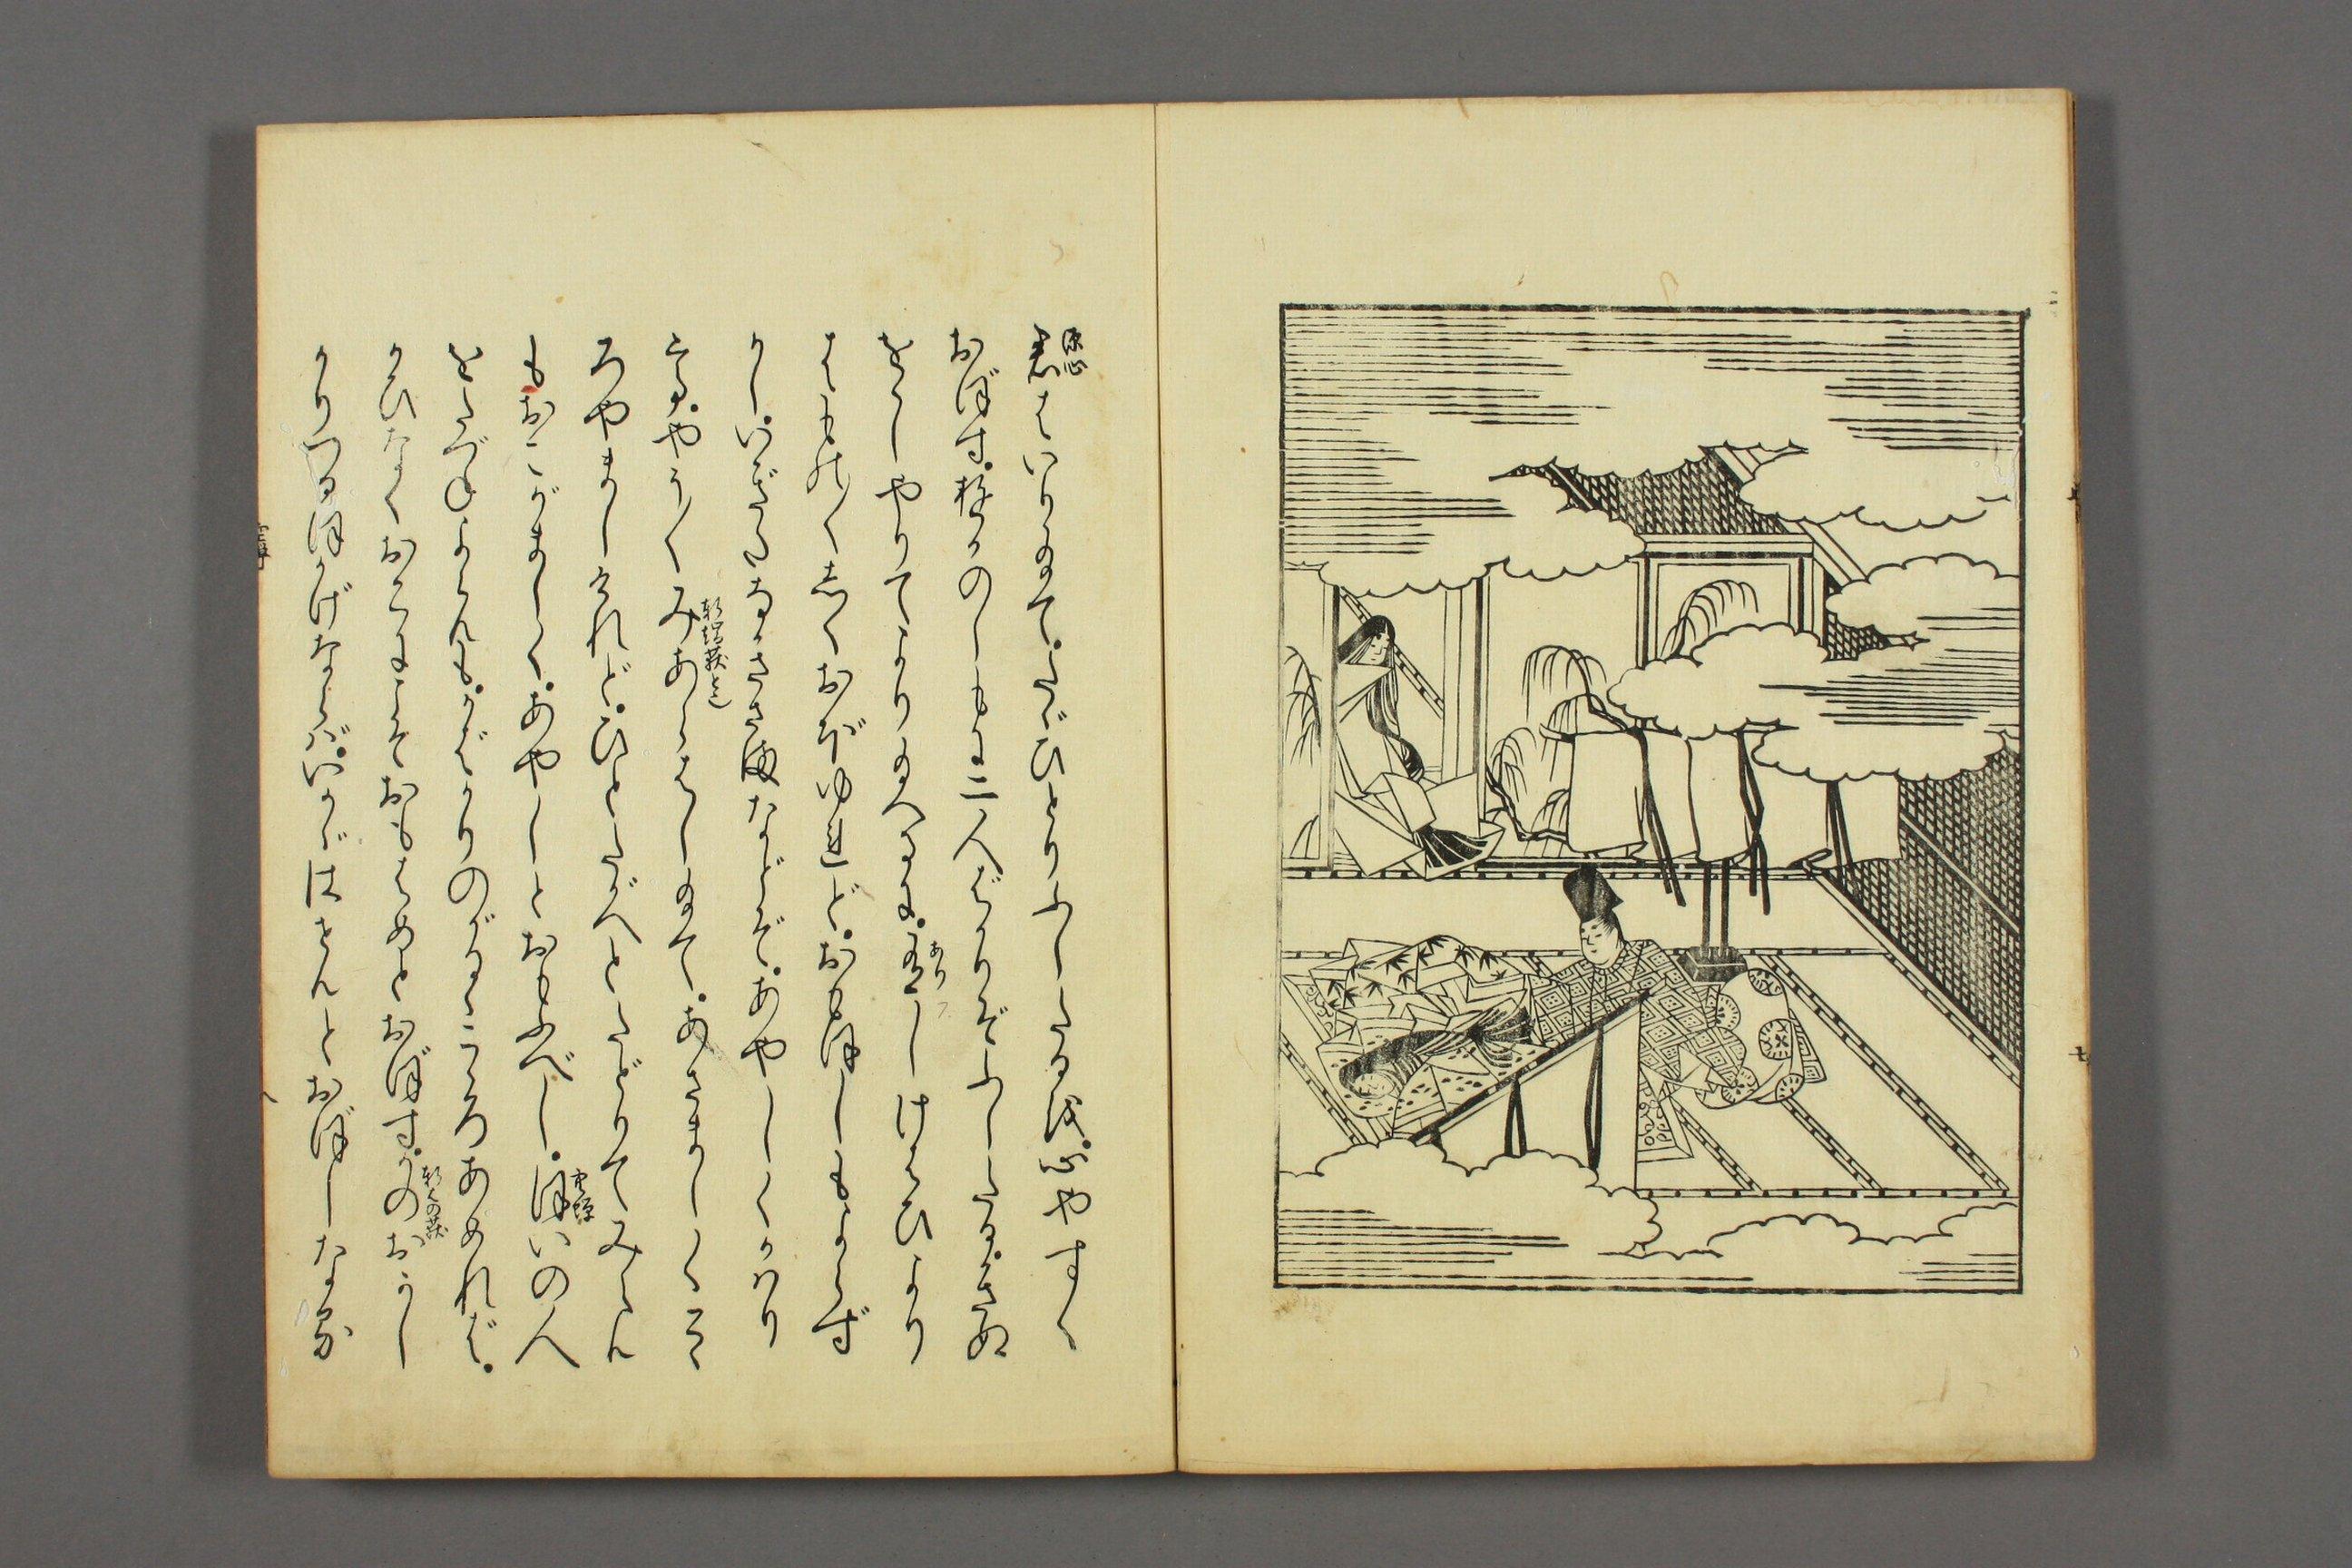 http://archive.wul.waseda.ac.jp/kosho/bunko30/bunko30_a0007/bunko30_a0007_0003/bunko30_a0007_0003_p0009.jpg